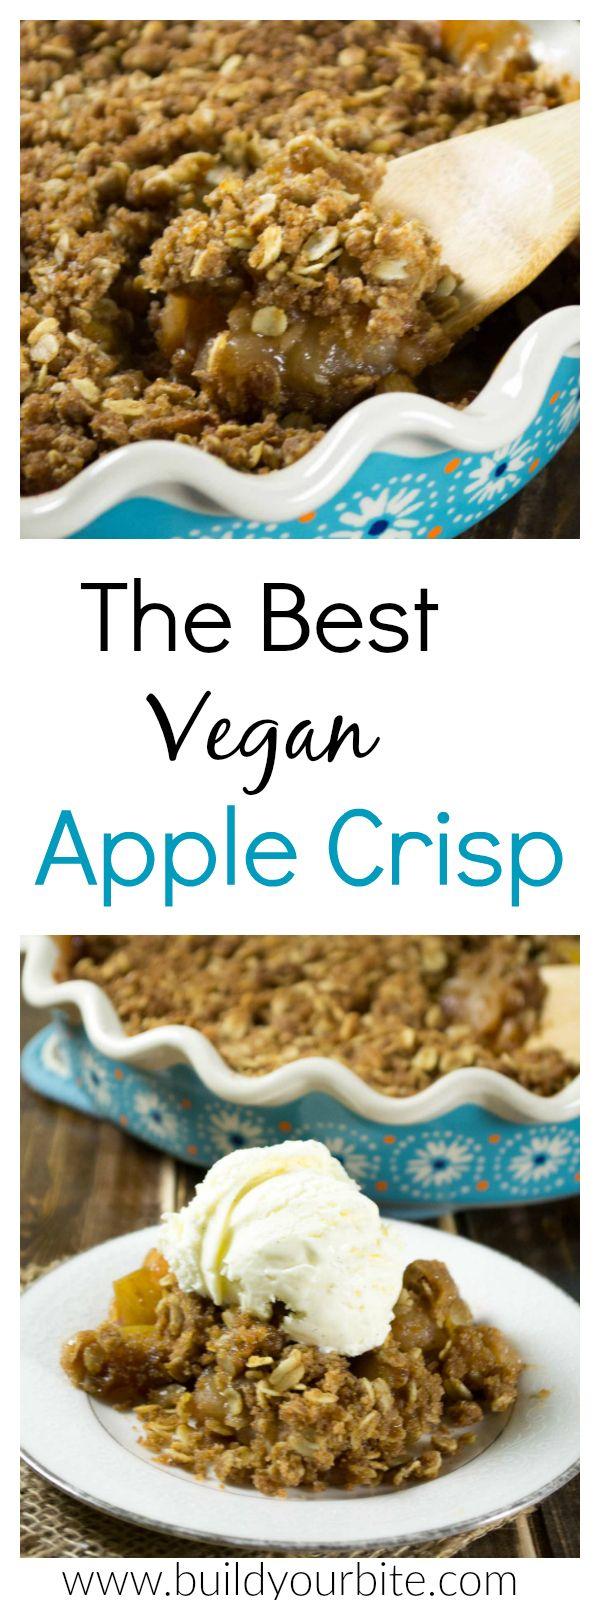 The BEST Vegan Apple Crisp Recipe - I can't get enough of this! #applerecipes